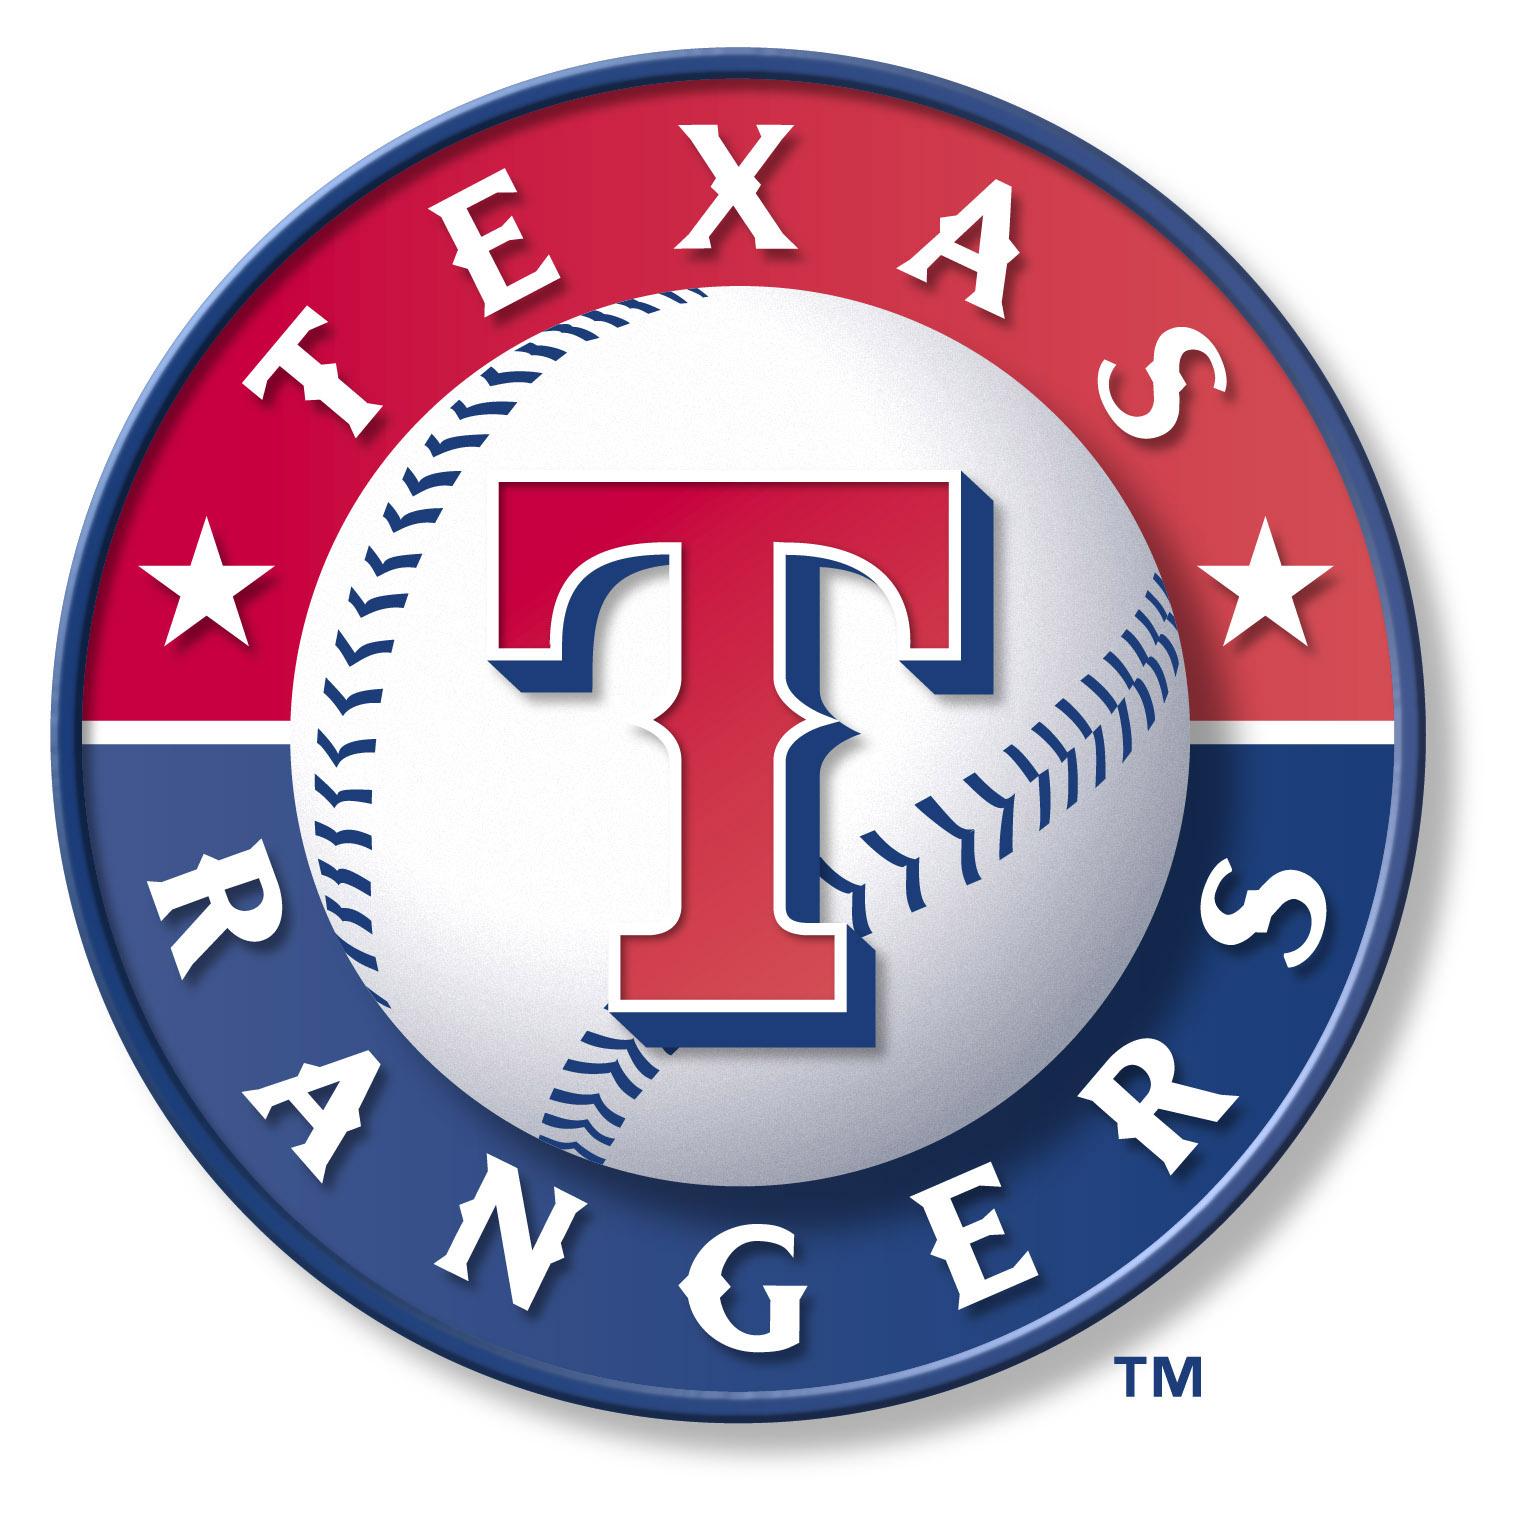 1518x1513 Texas Rangers Baseball Logo Clip Art Free Image